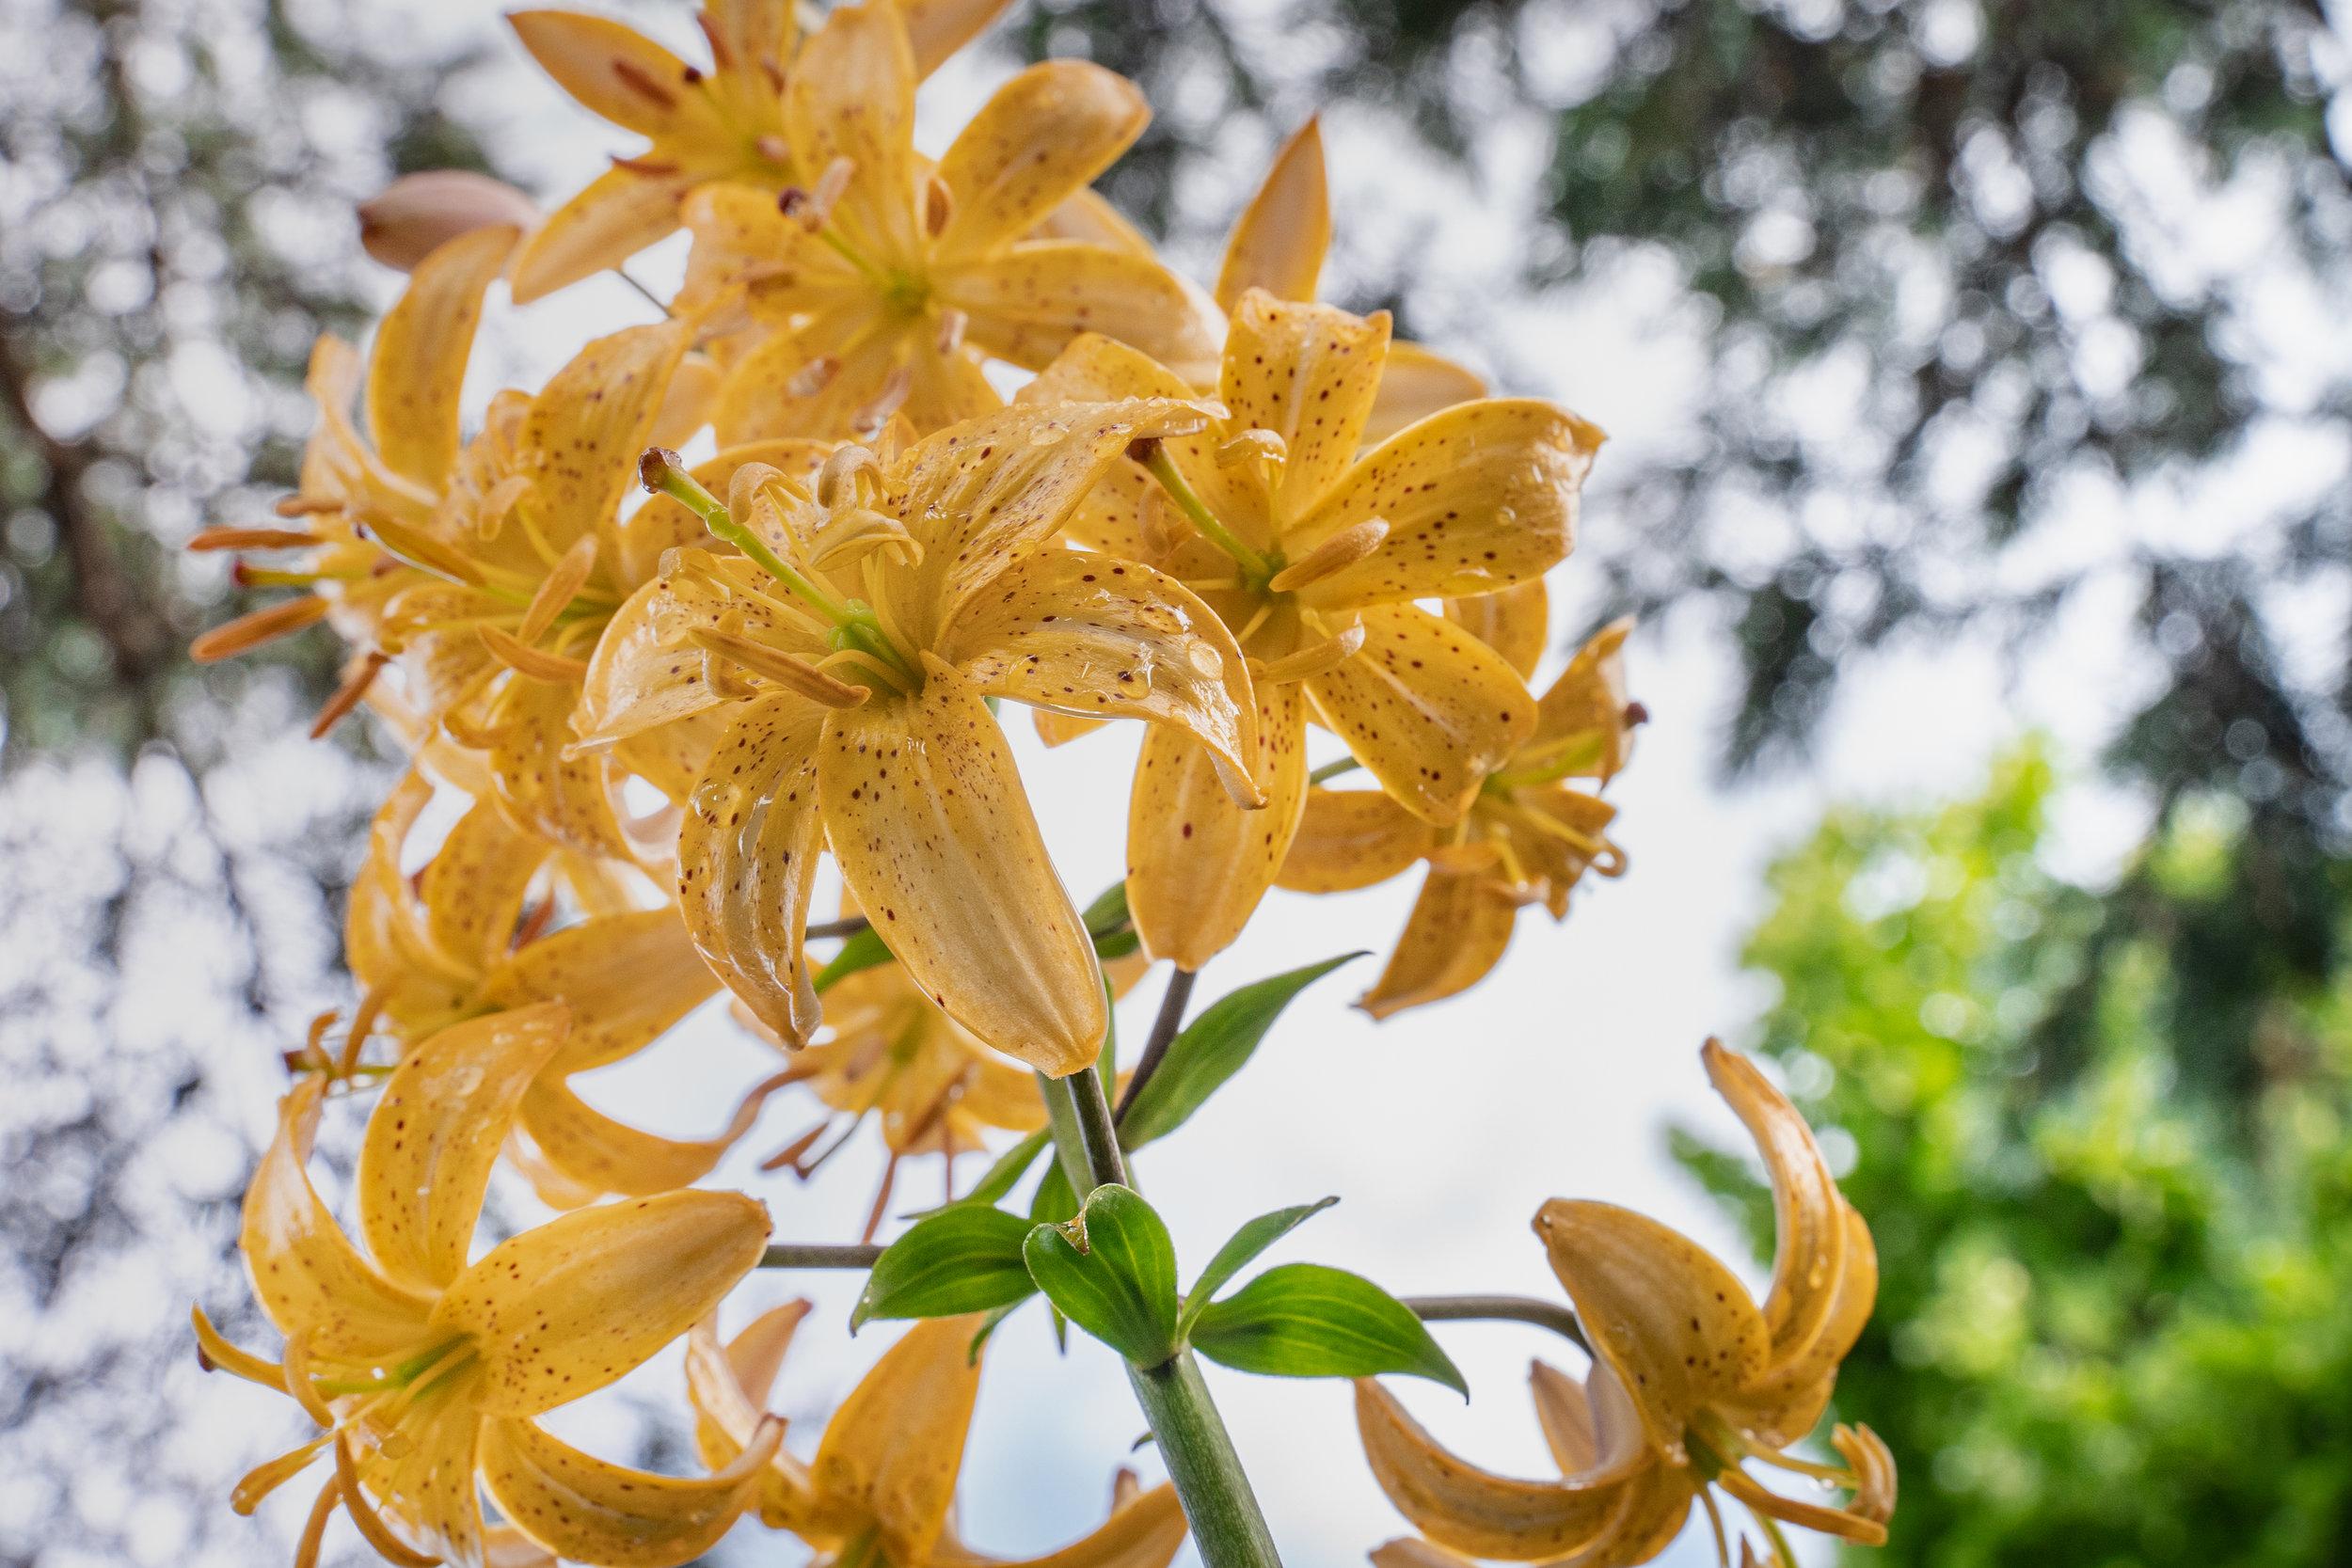 07-02-19-Lilies and Dahlias-1.jpg